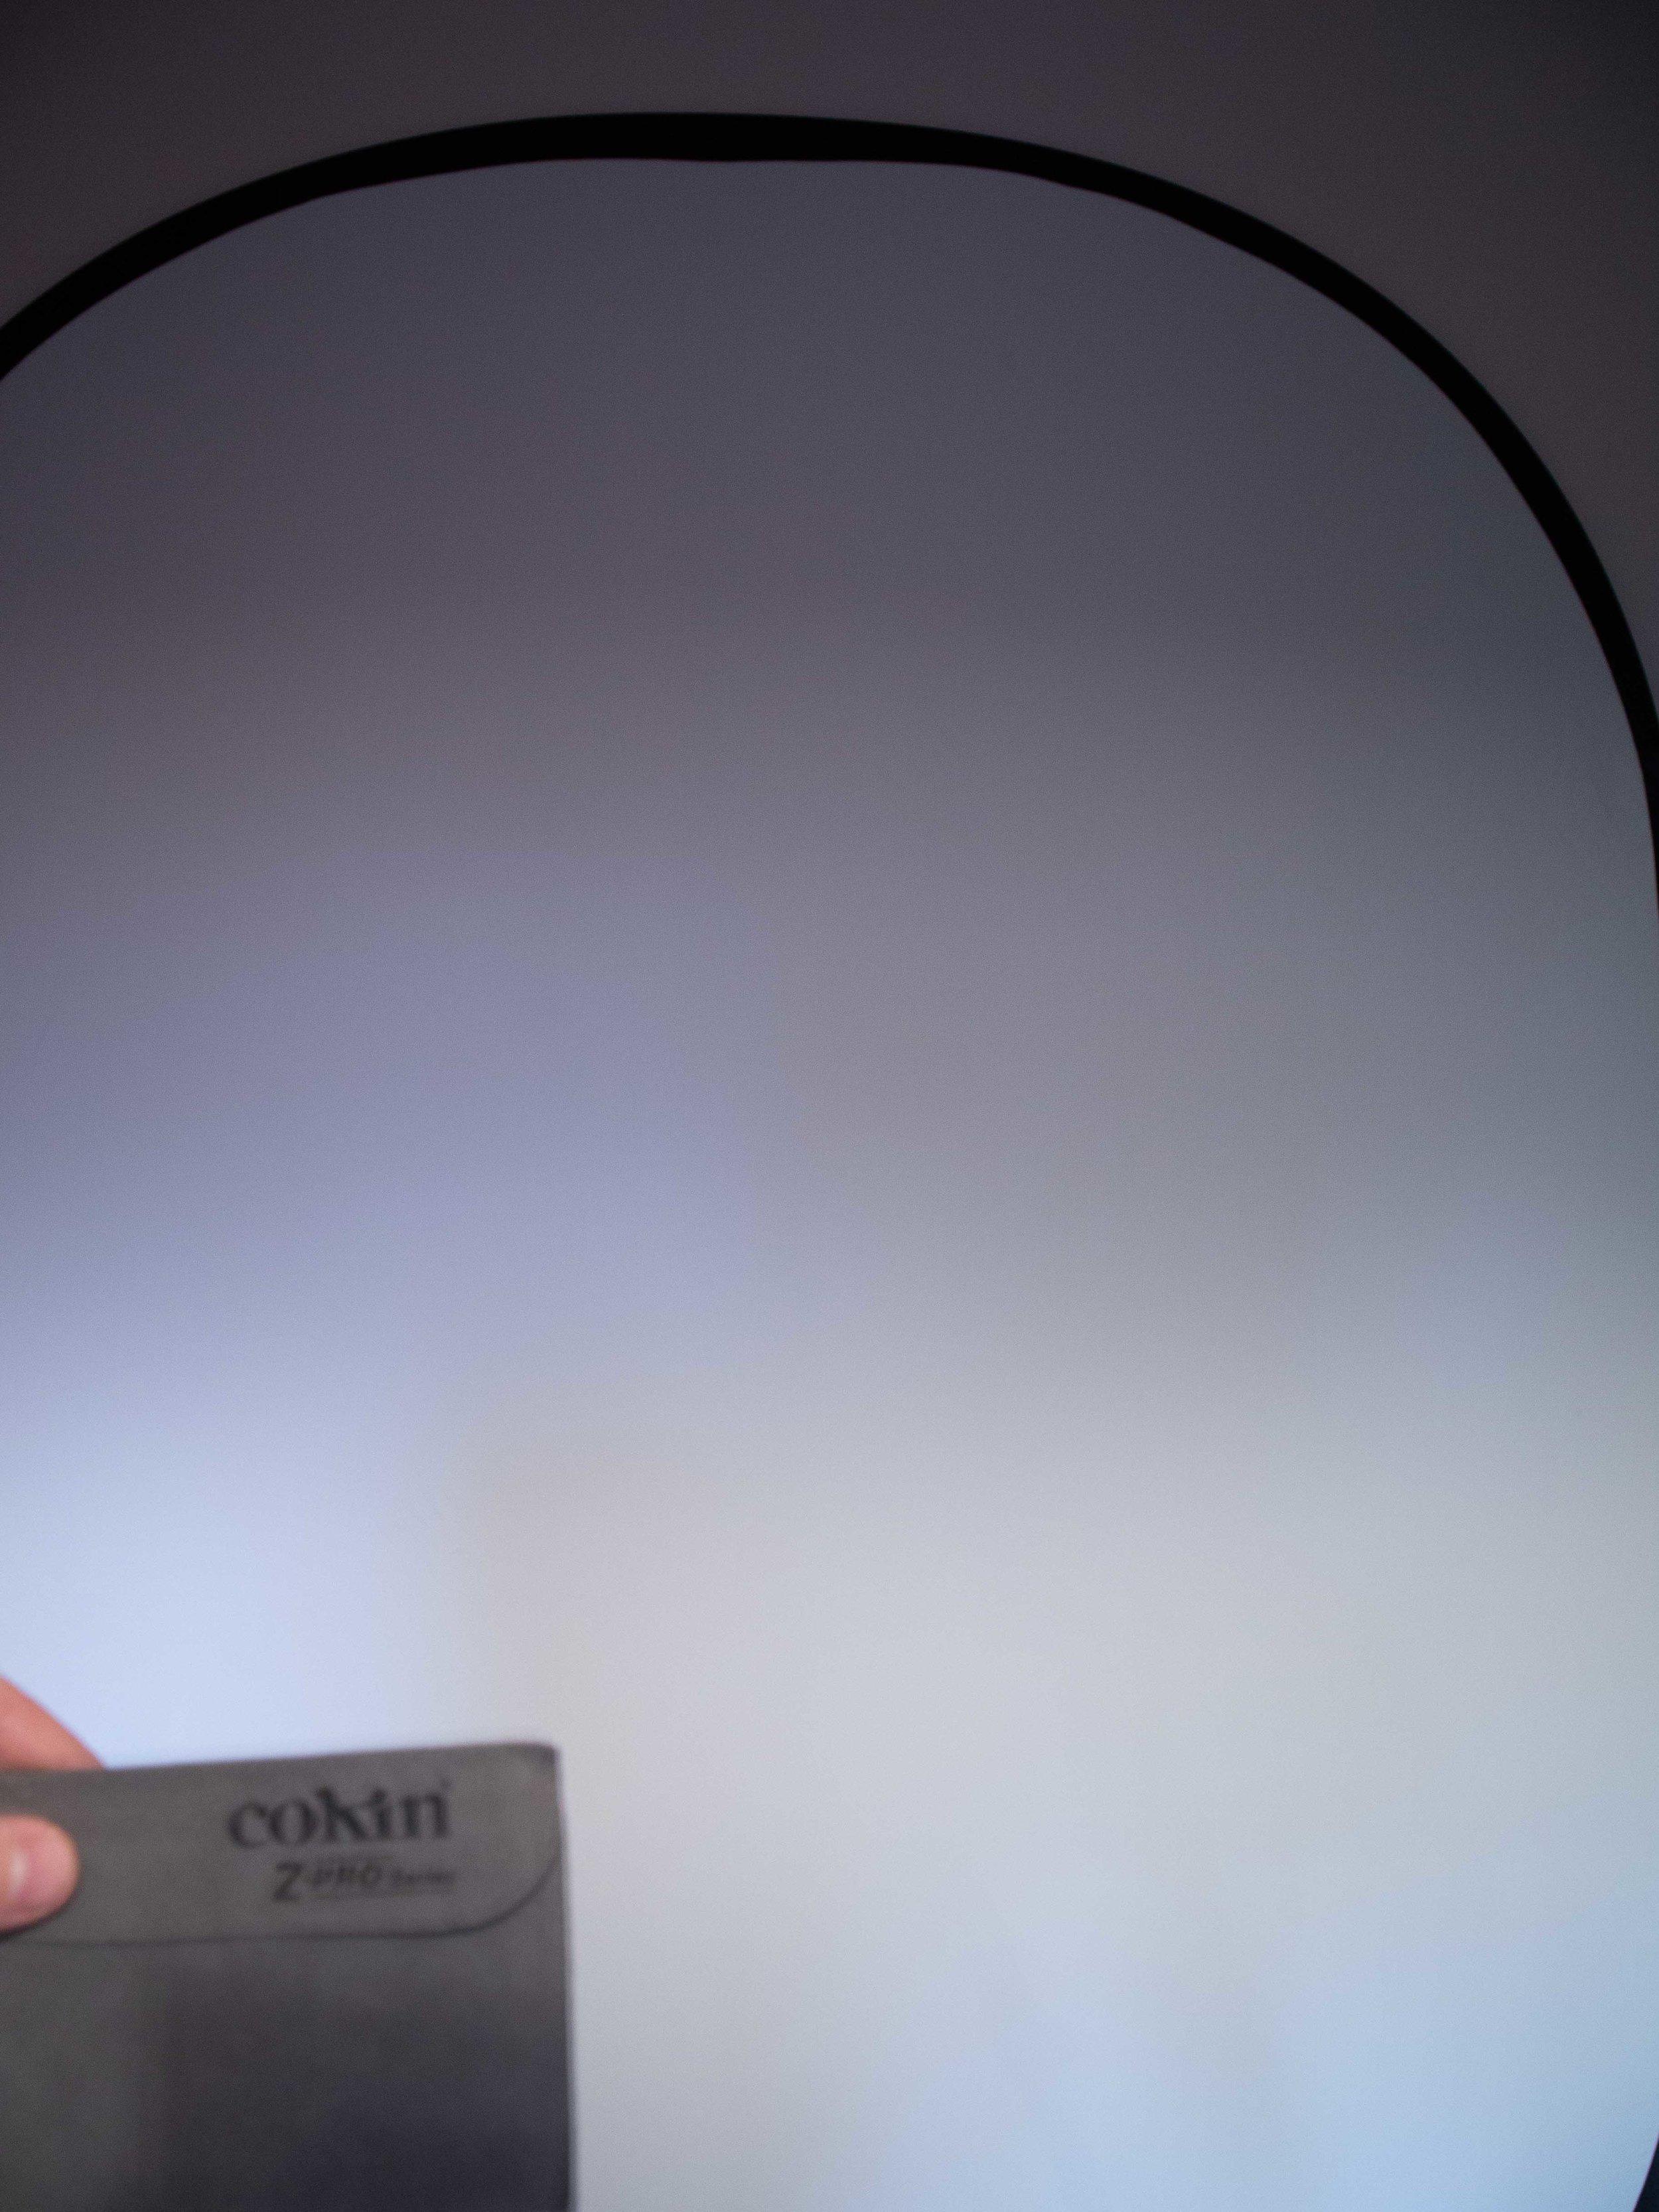 Filter Test Cokin vs 84.5mm (5 of 6).jpg